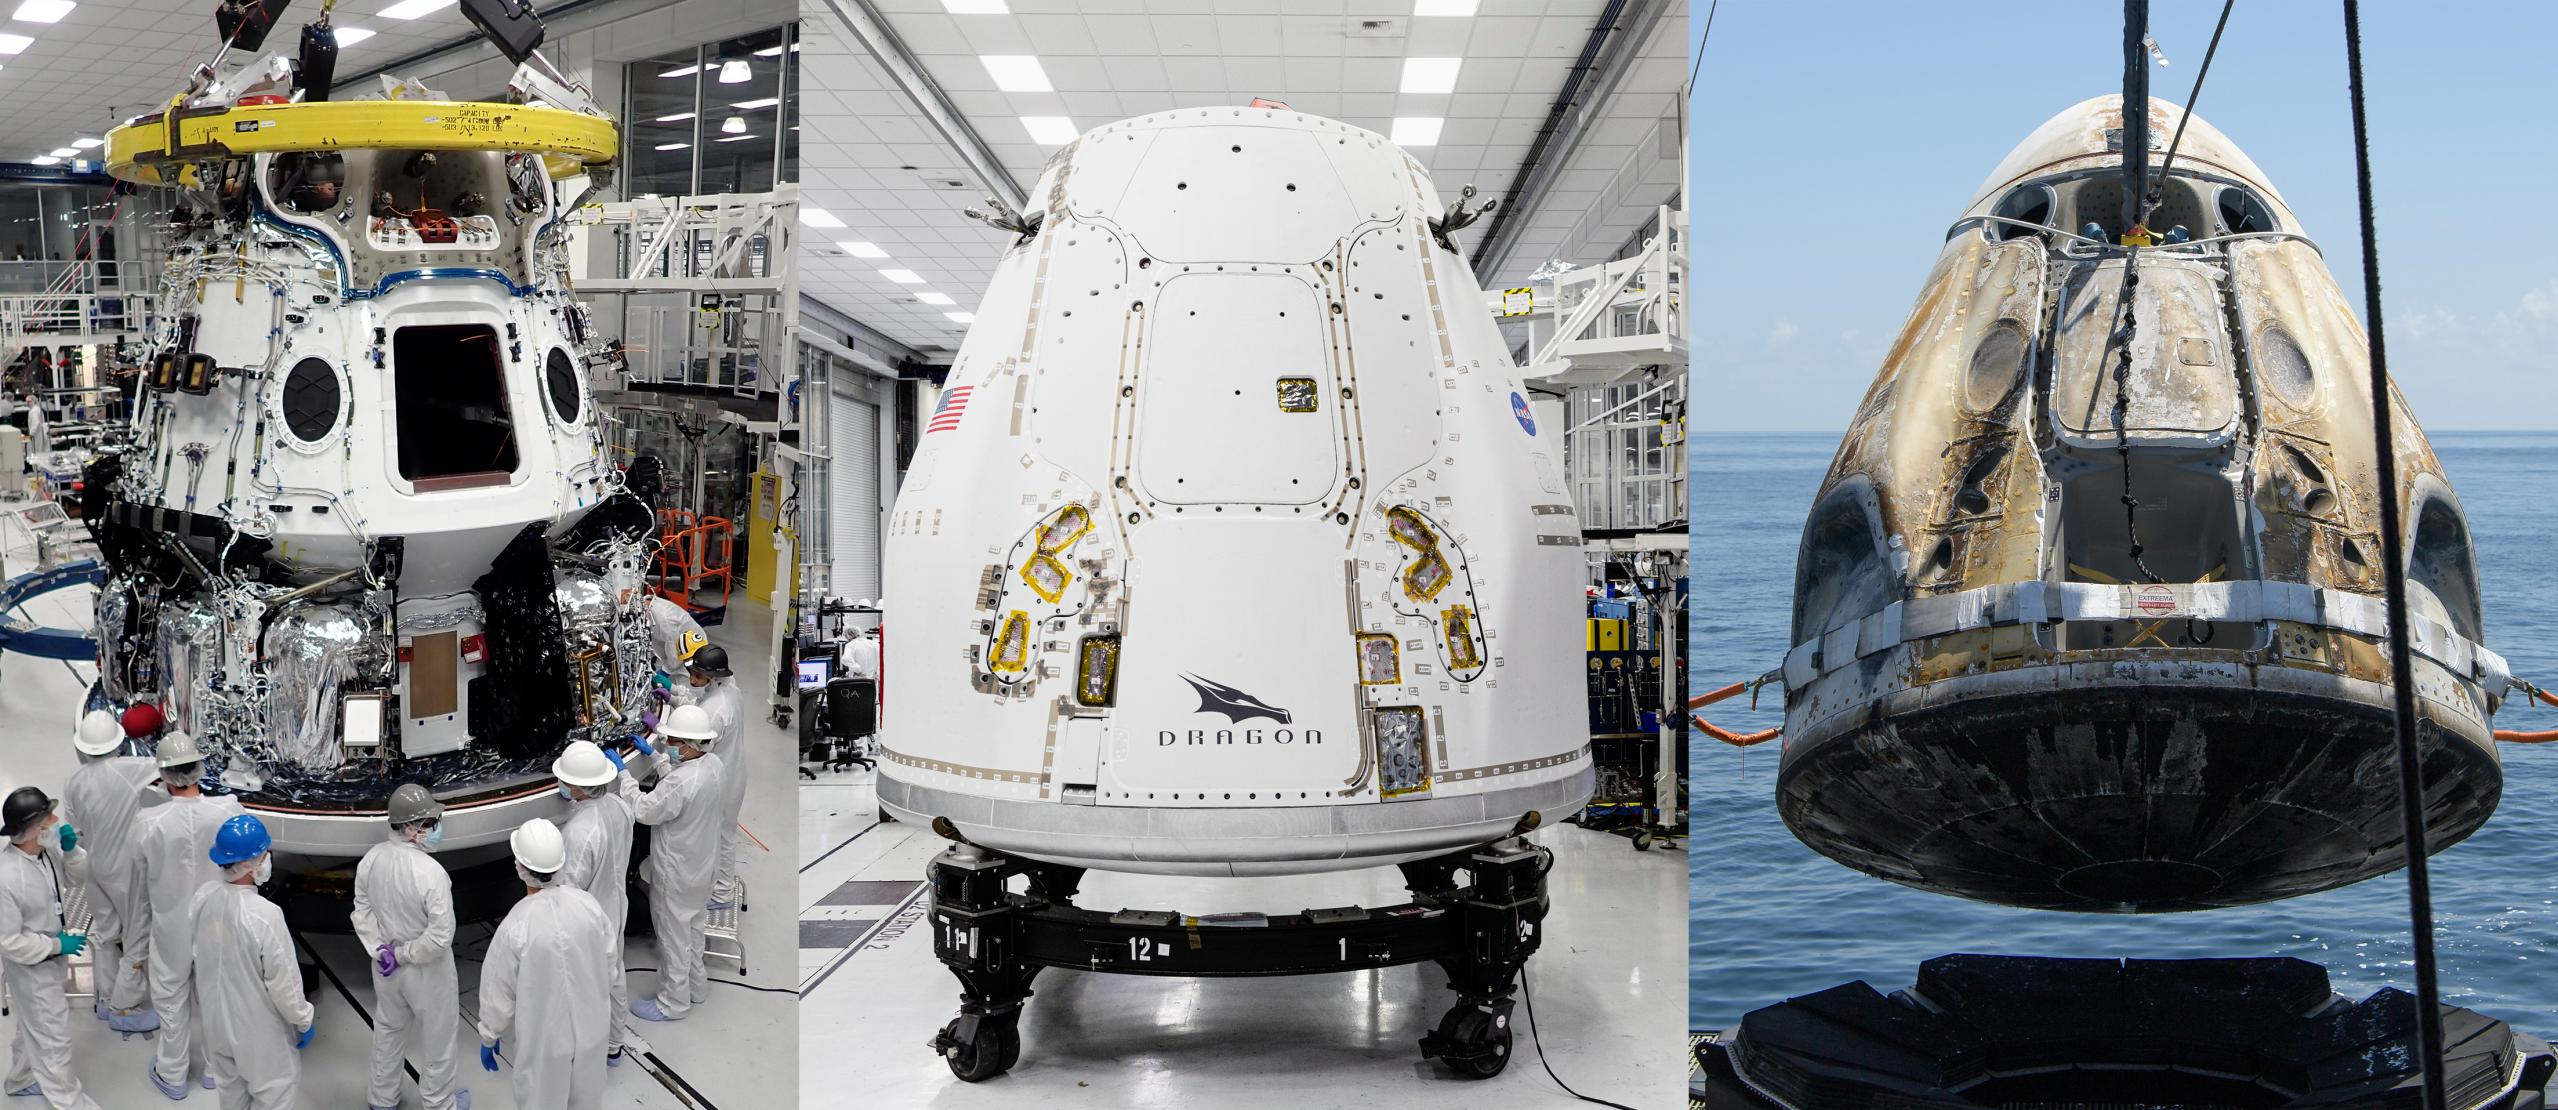 Crew Dragon Cargo Dragon CRS-21 Demo-2 (SpaceX – NASA) 1 (c)